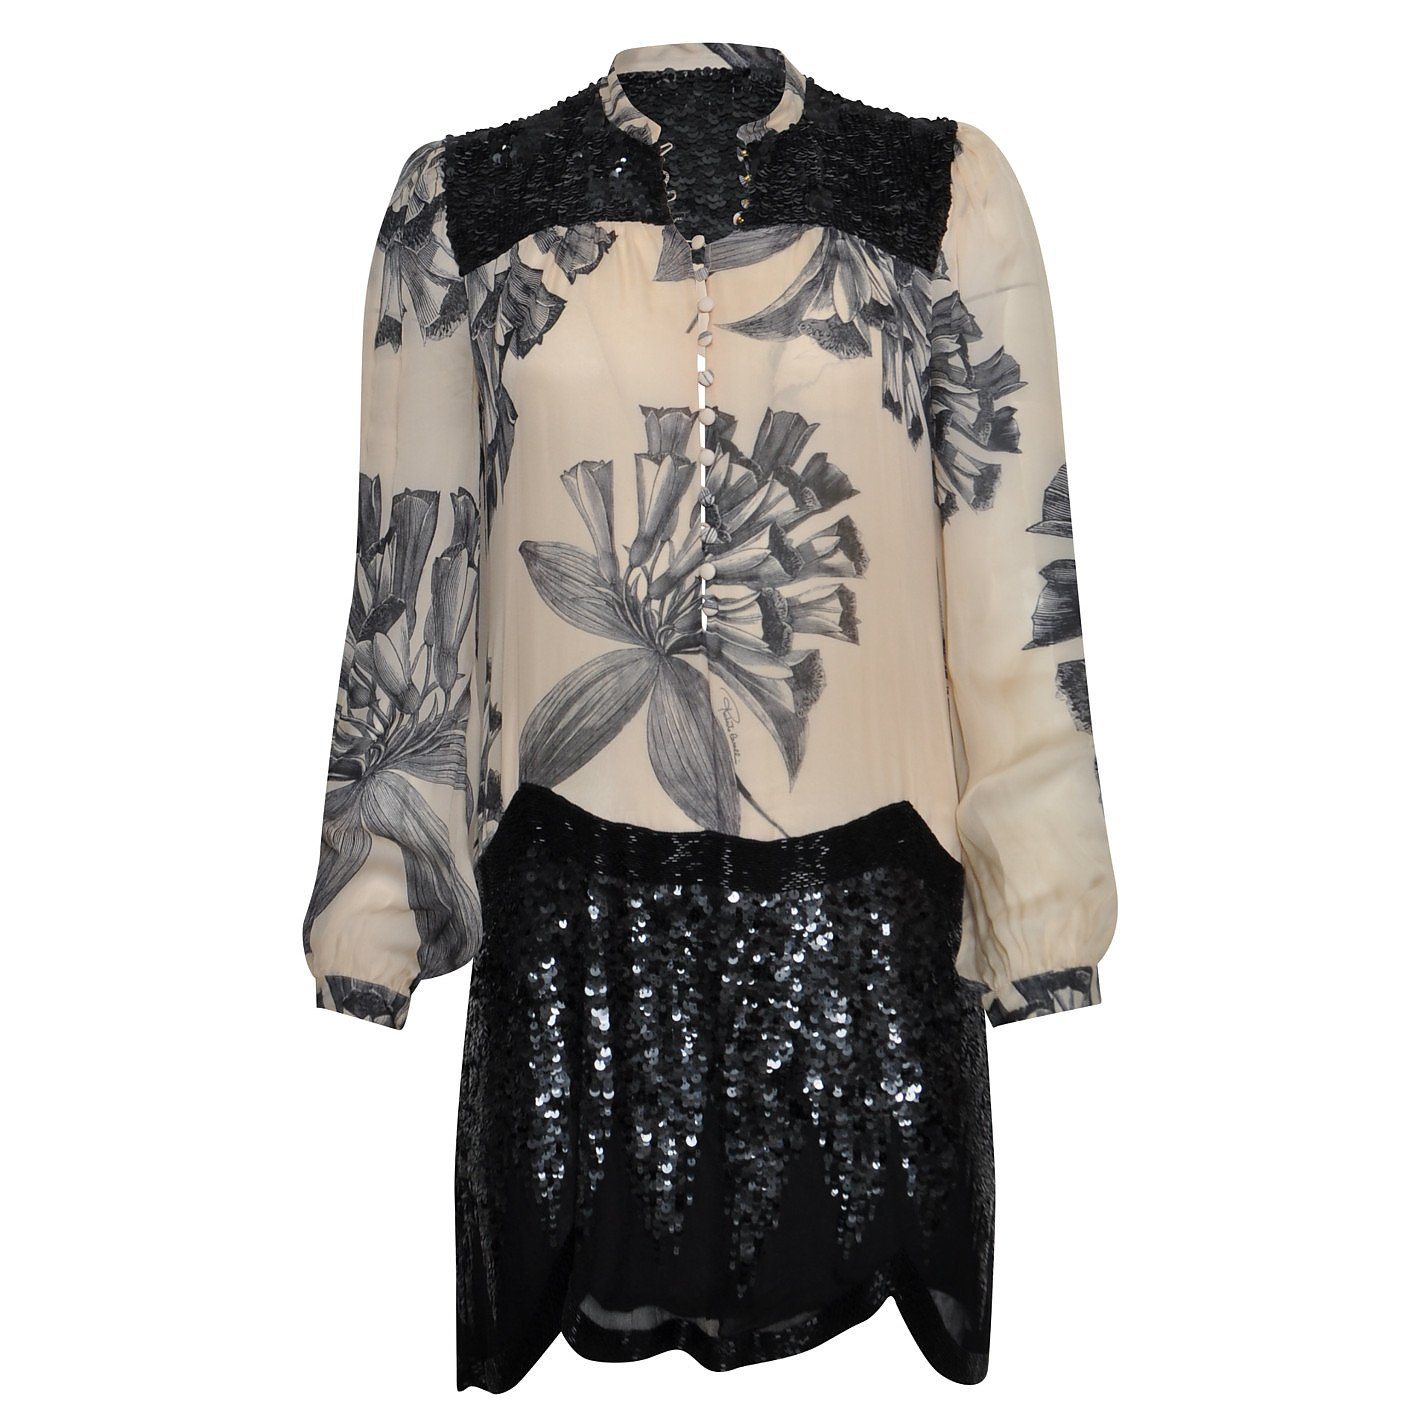 Roberto Cavalli Sequin-Embellished Printed Tunic Dress